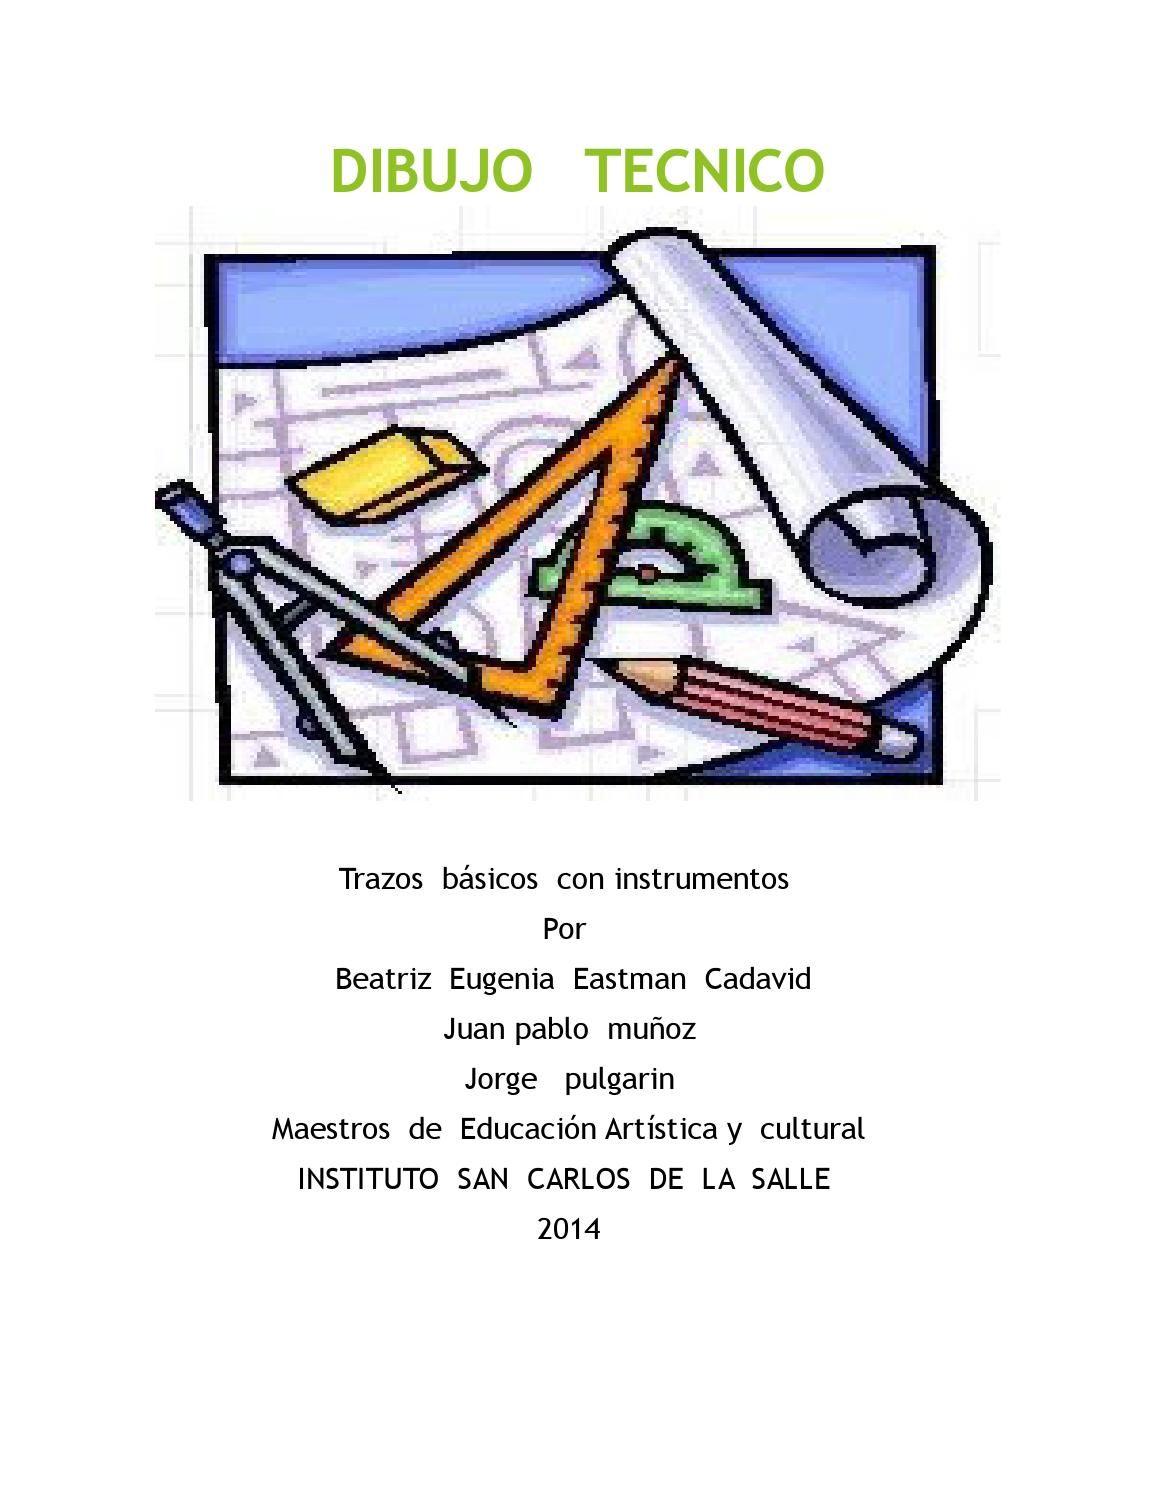 Dibujo tecnico tipos de trazos | Libros | Pinterest | Costura ...